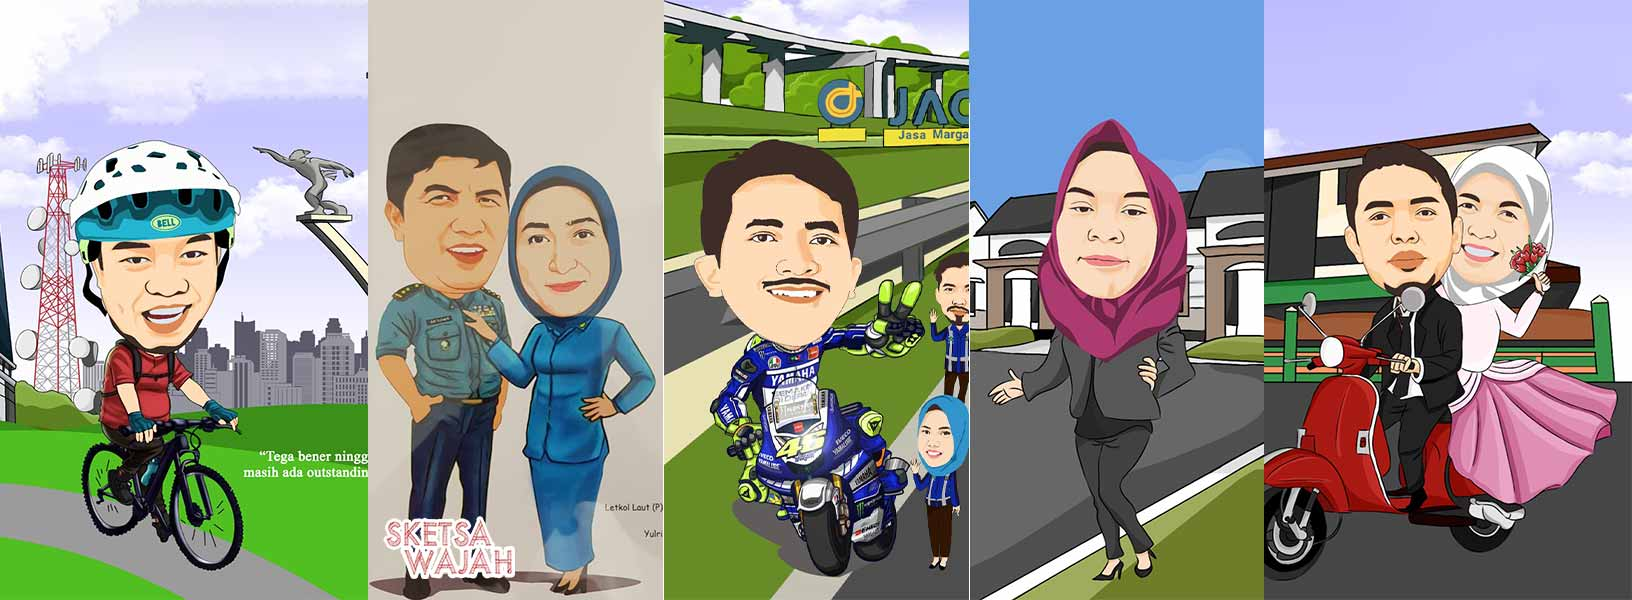 Karya Id Karikatur sketcher Sketsa Wajah